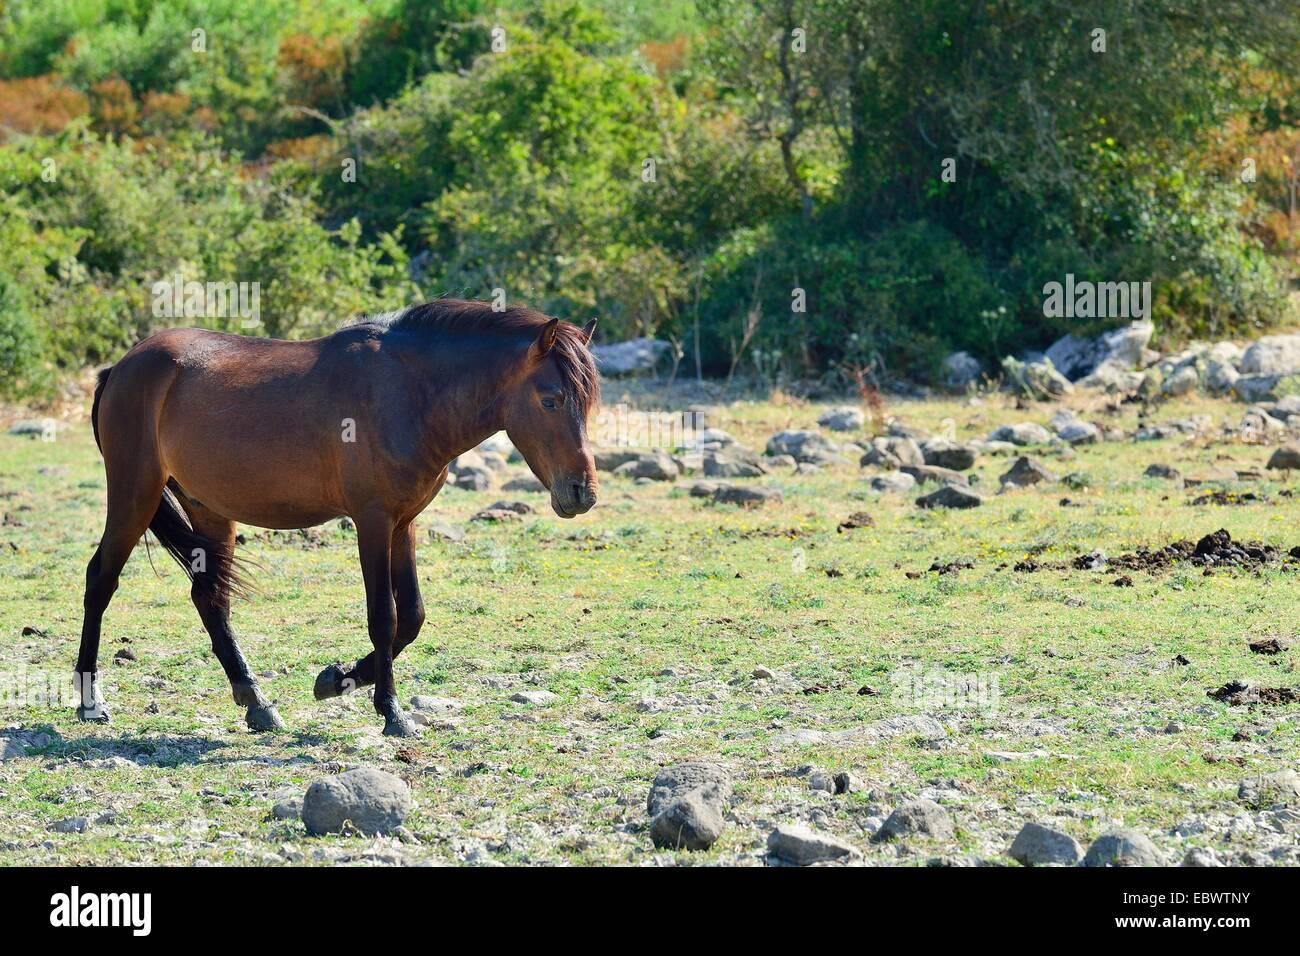 Wild horse, bay stallion, on the Giara di Gesturi plateau, Medio Campidano, Sardinia, Italy Province, Europe - Stock Image